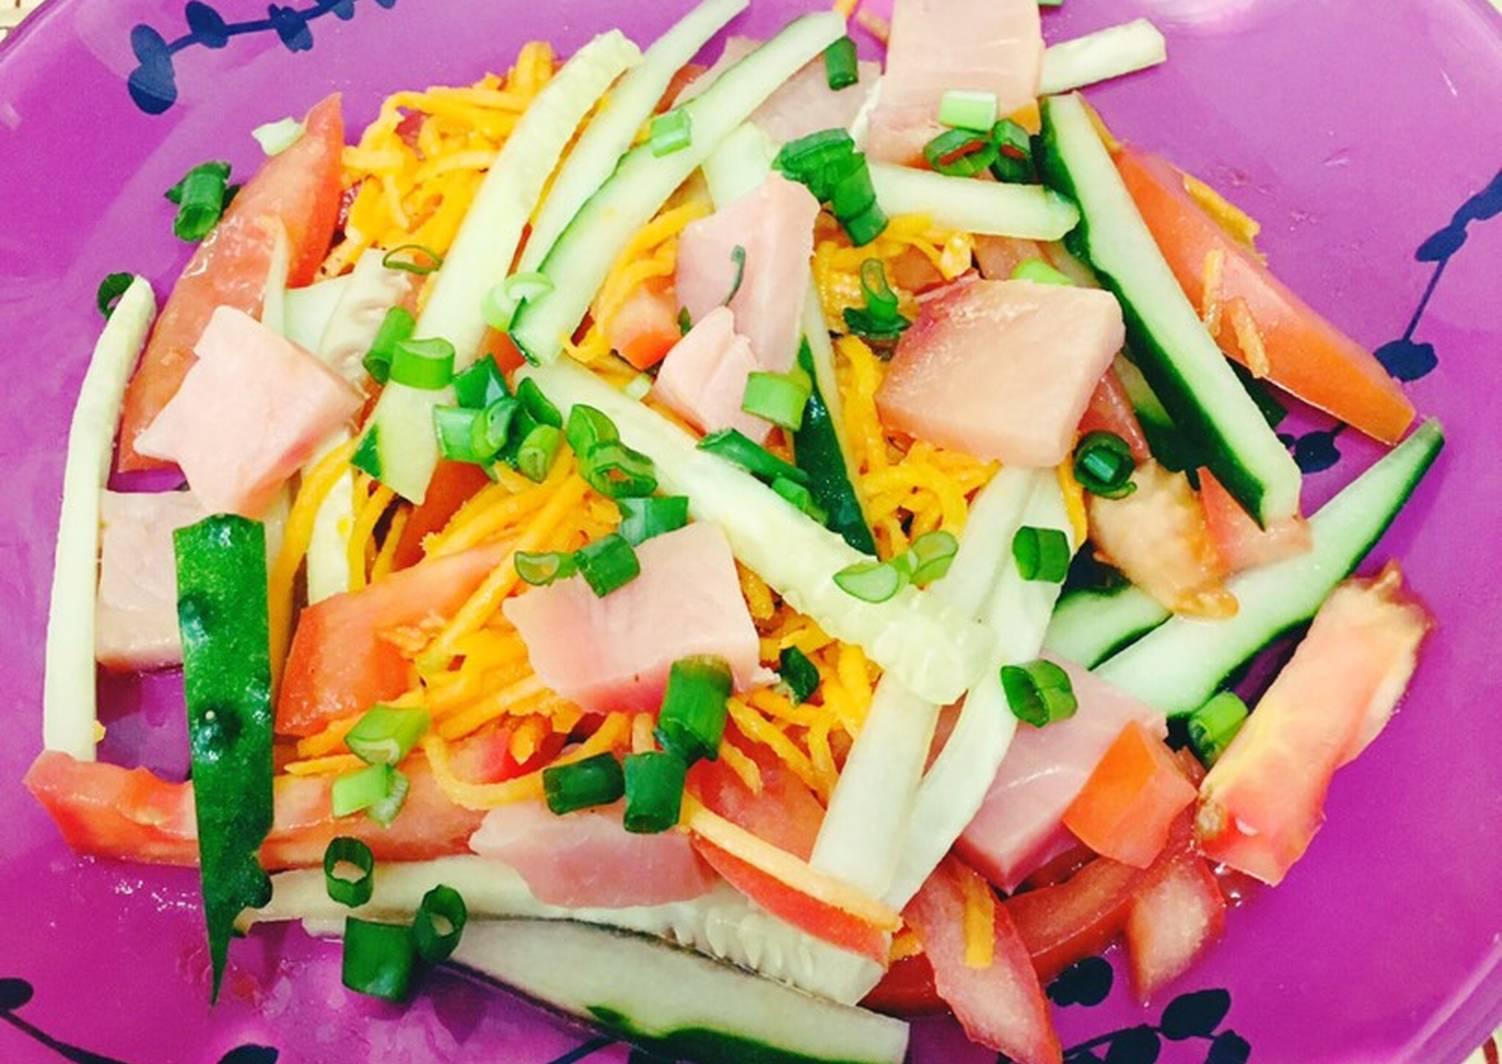 изделия салат венеция рецепт с фото патрулирует